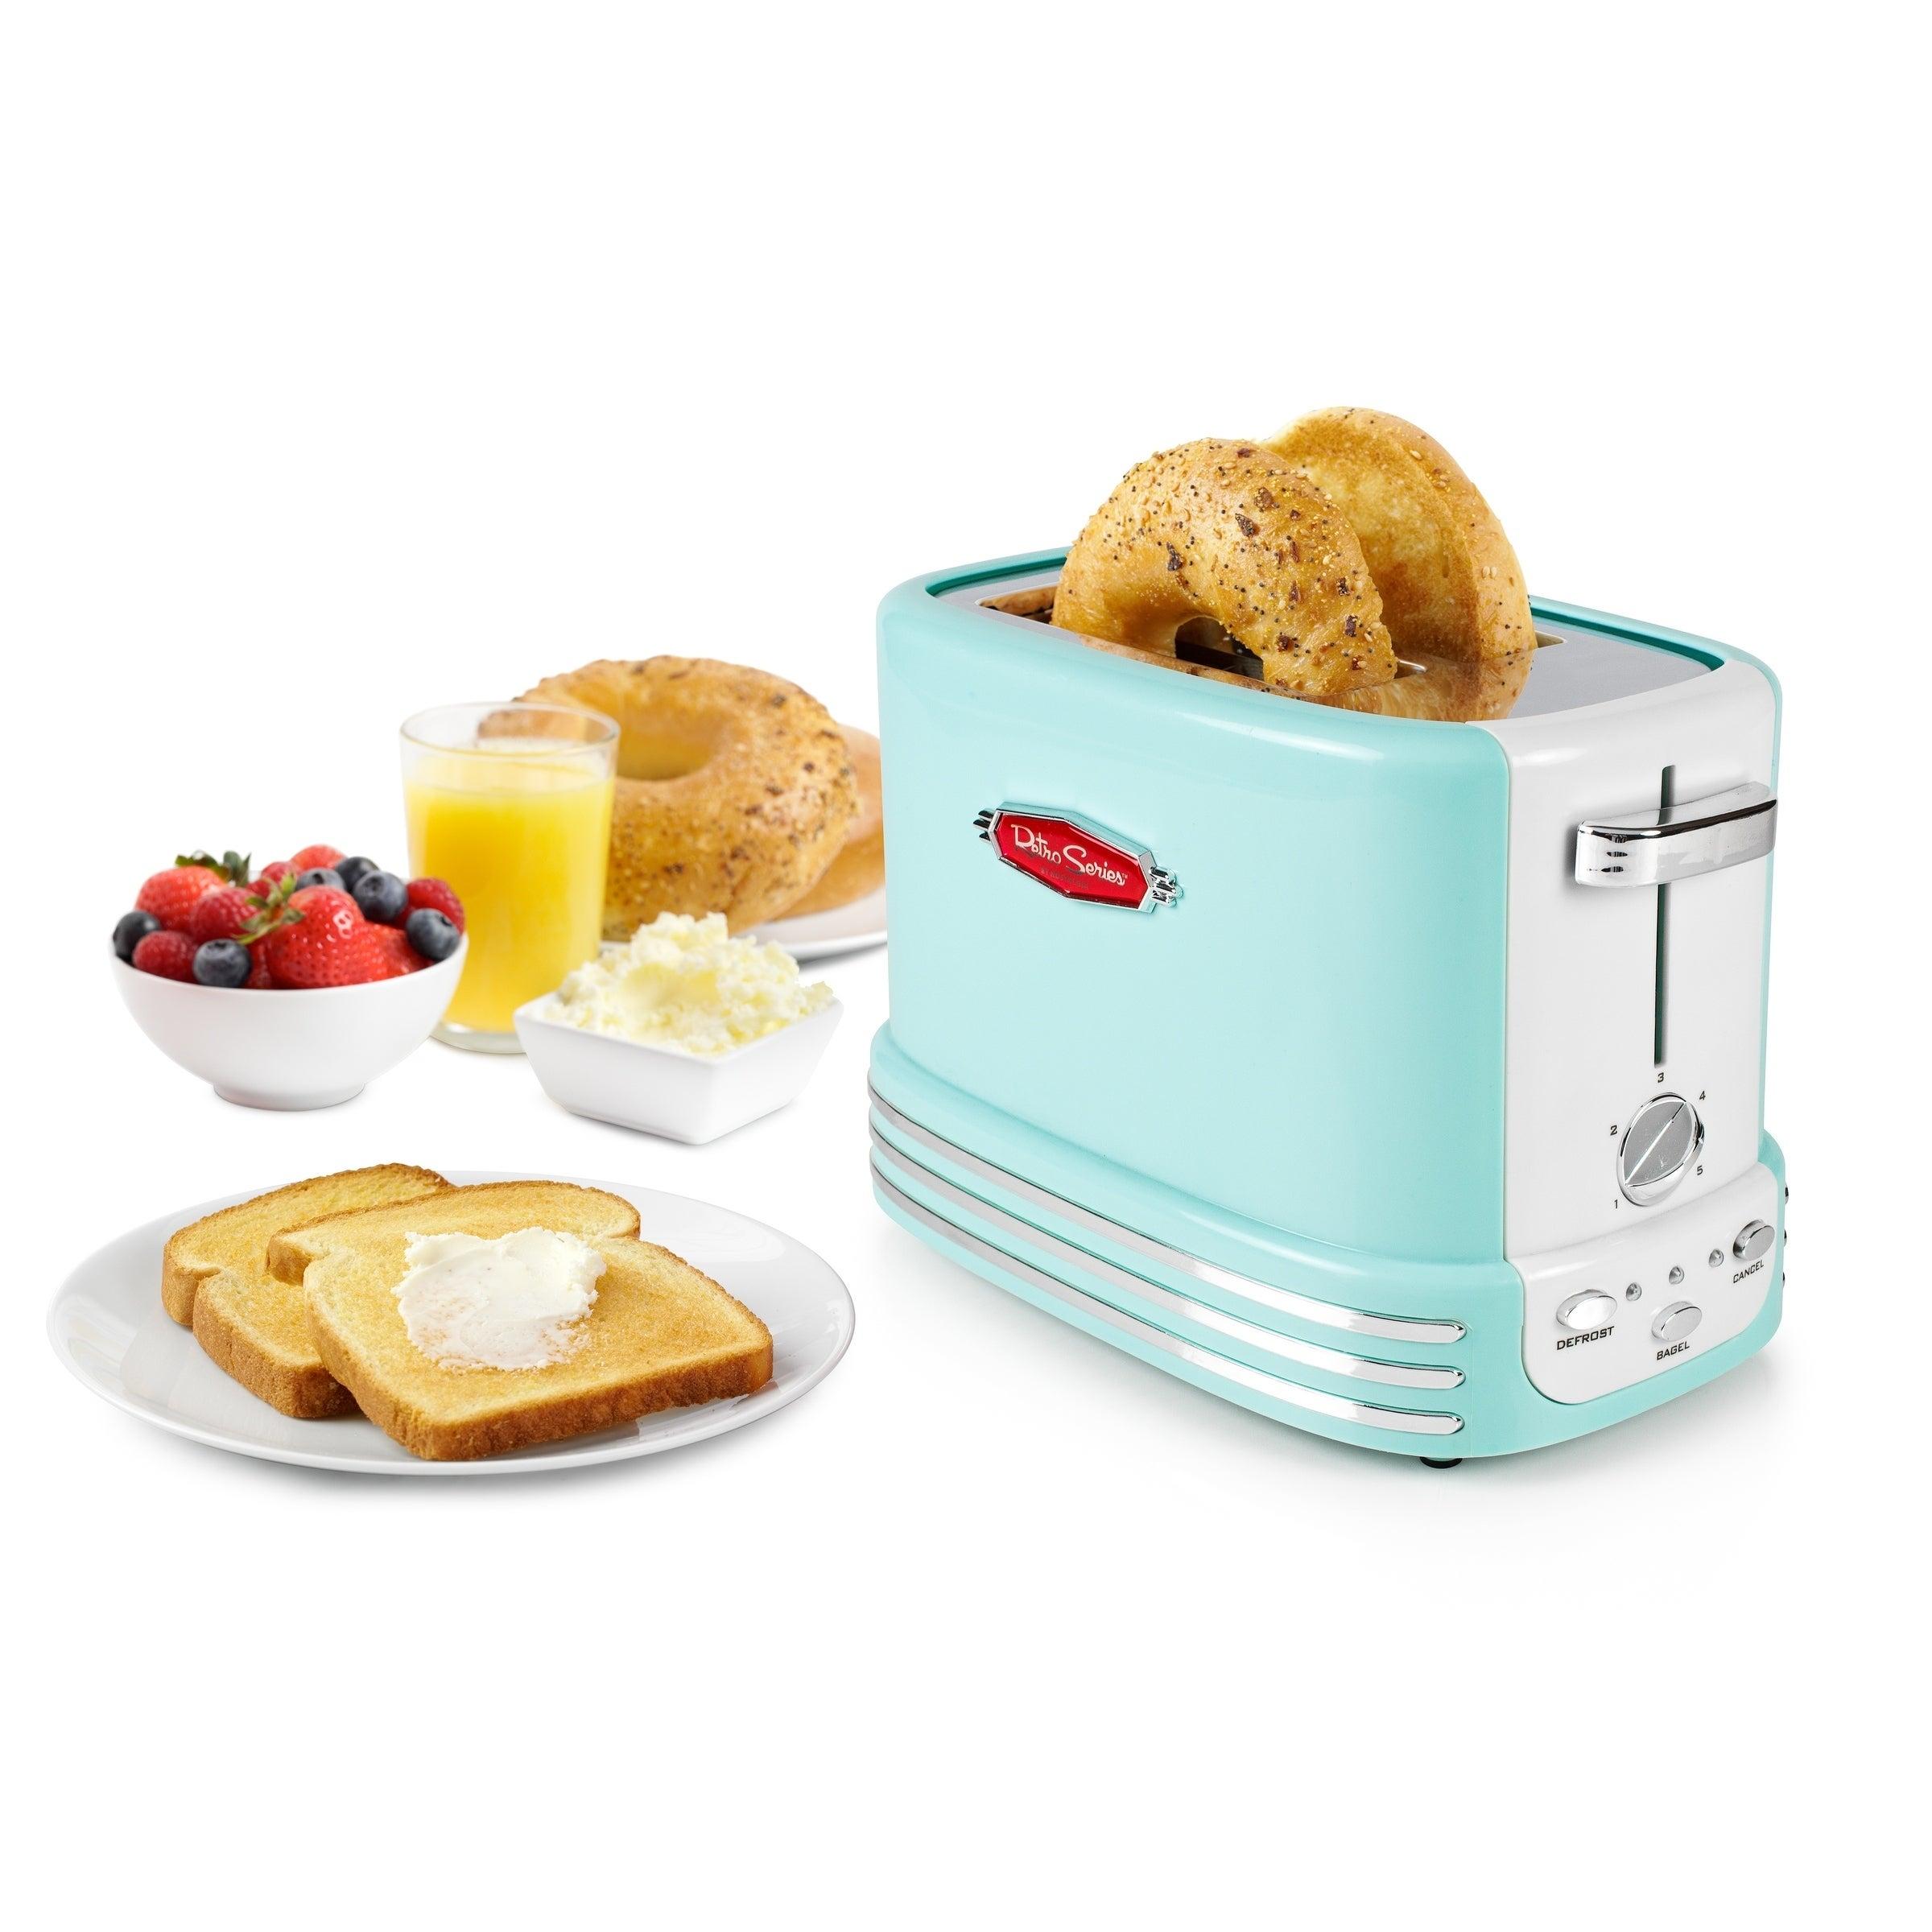 Kitchen Appliances | Find Great Kitchen & Dining Deals Shopping at ...